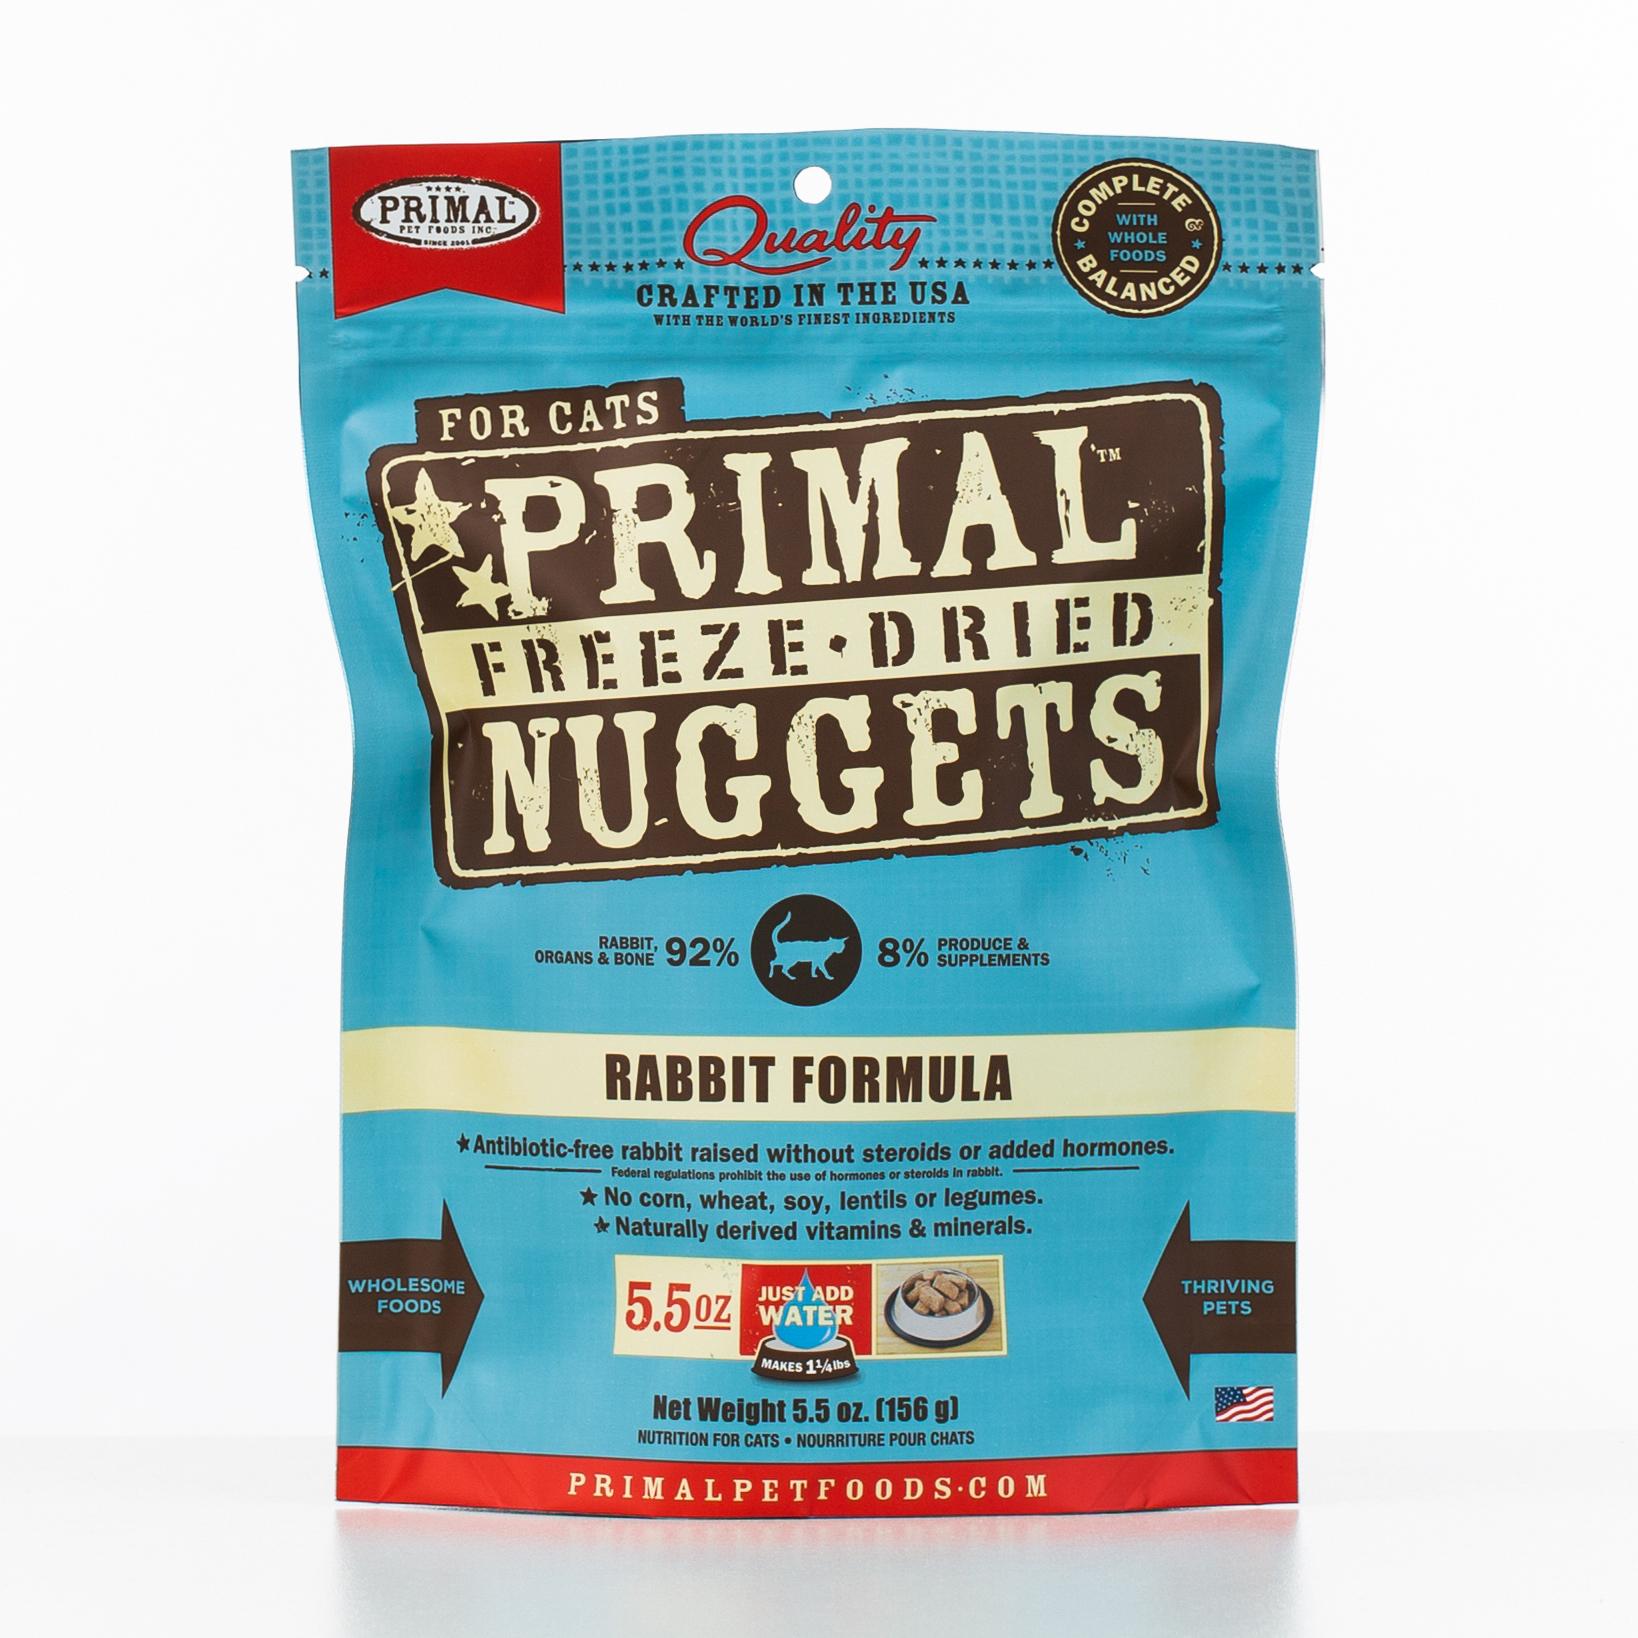 Primal Raw Freeze-Dried Nuggets Rabbit Formula Cat Food, 5.5-oz bag